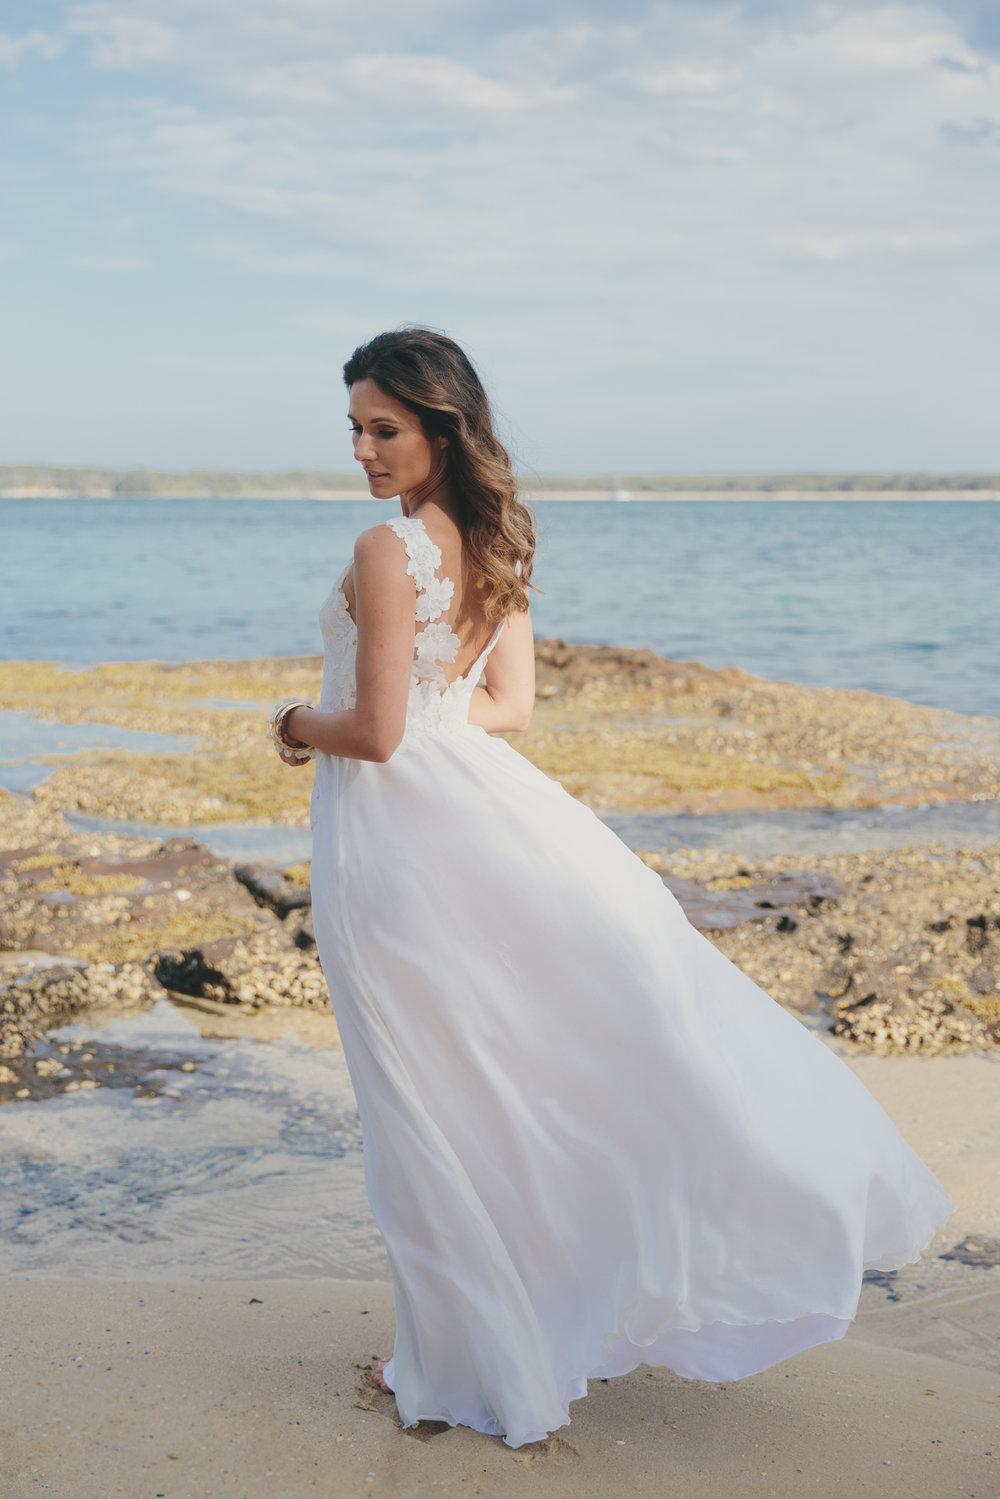 Amber Joy Photography   Laura Kinnear  Amy New Bridal  The Bridal Bar